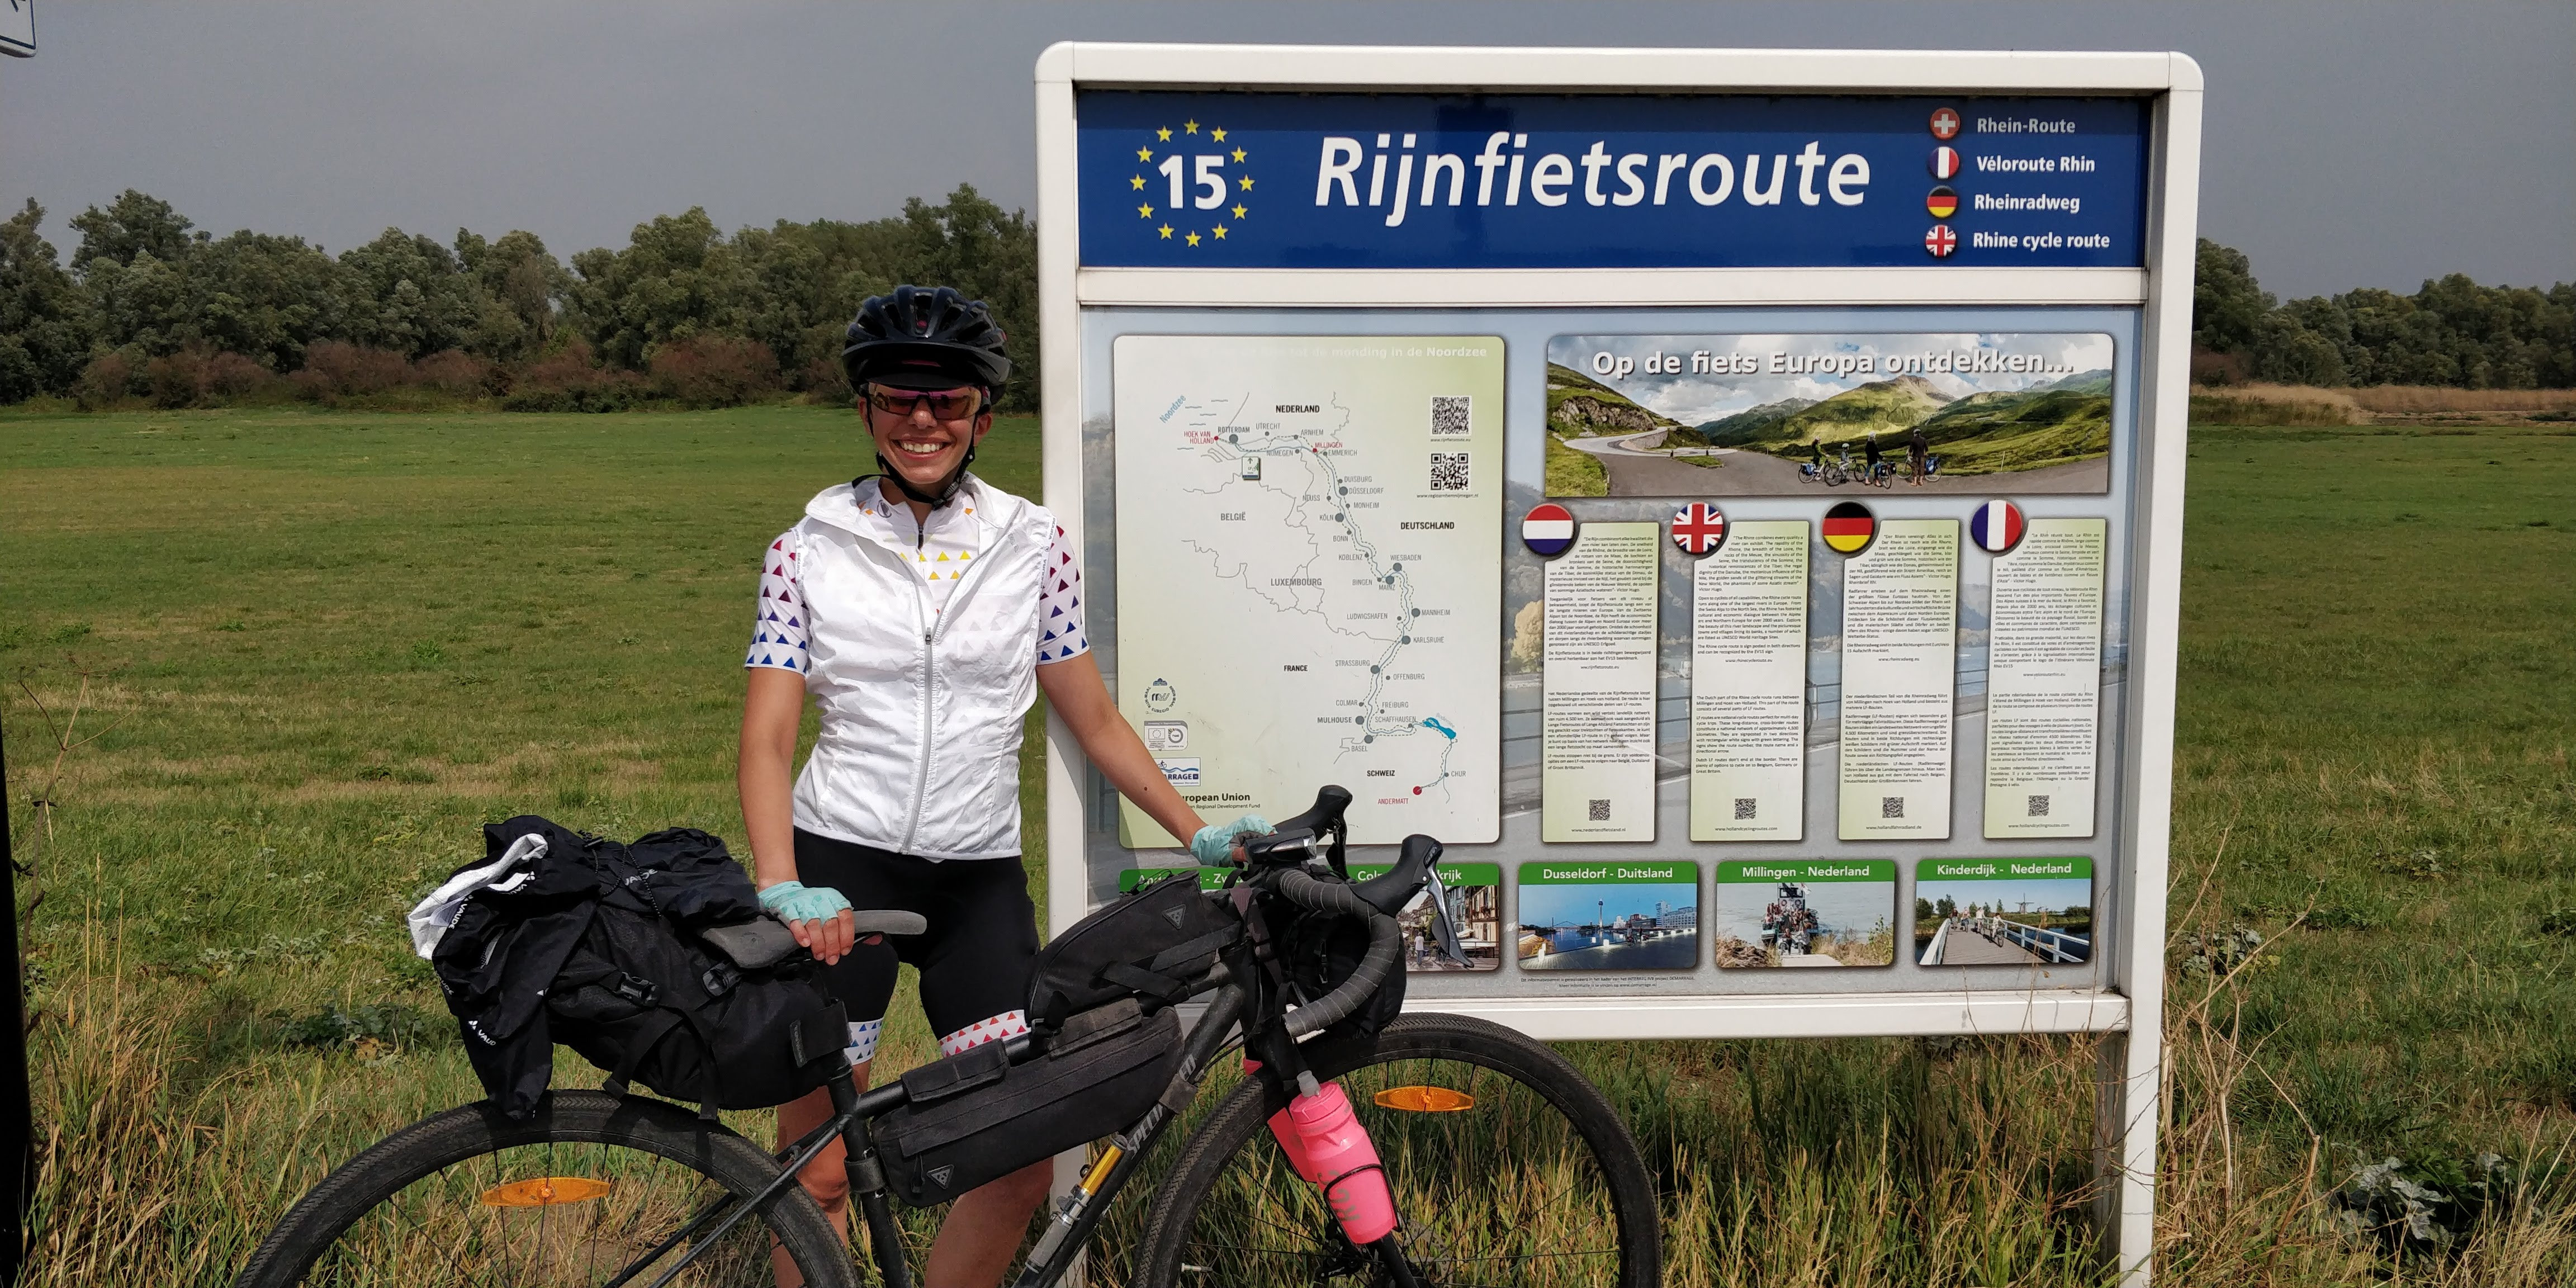 viaggiare in bici simona melani